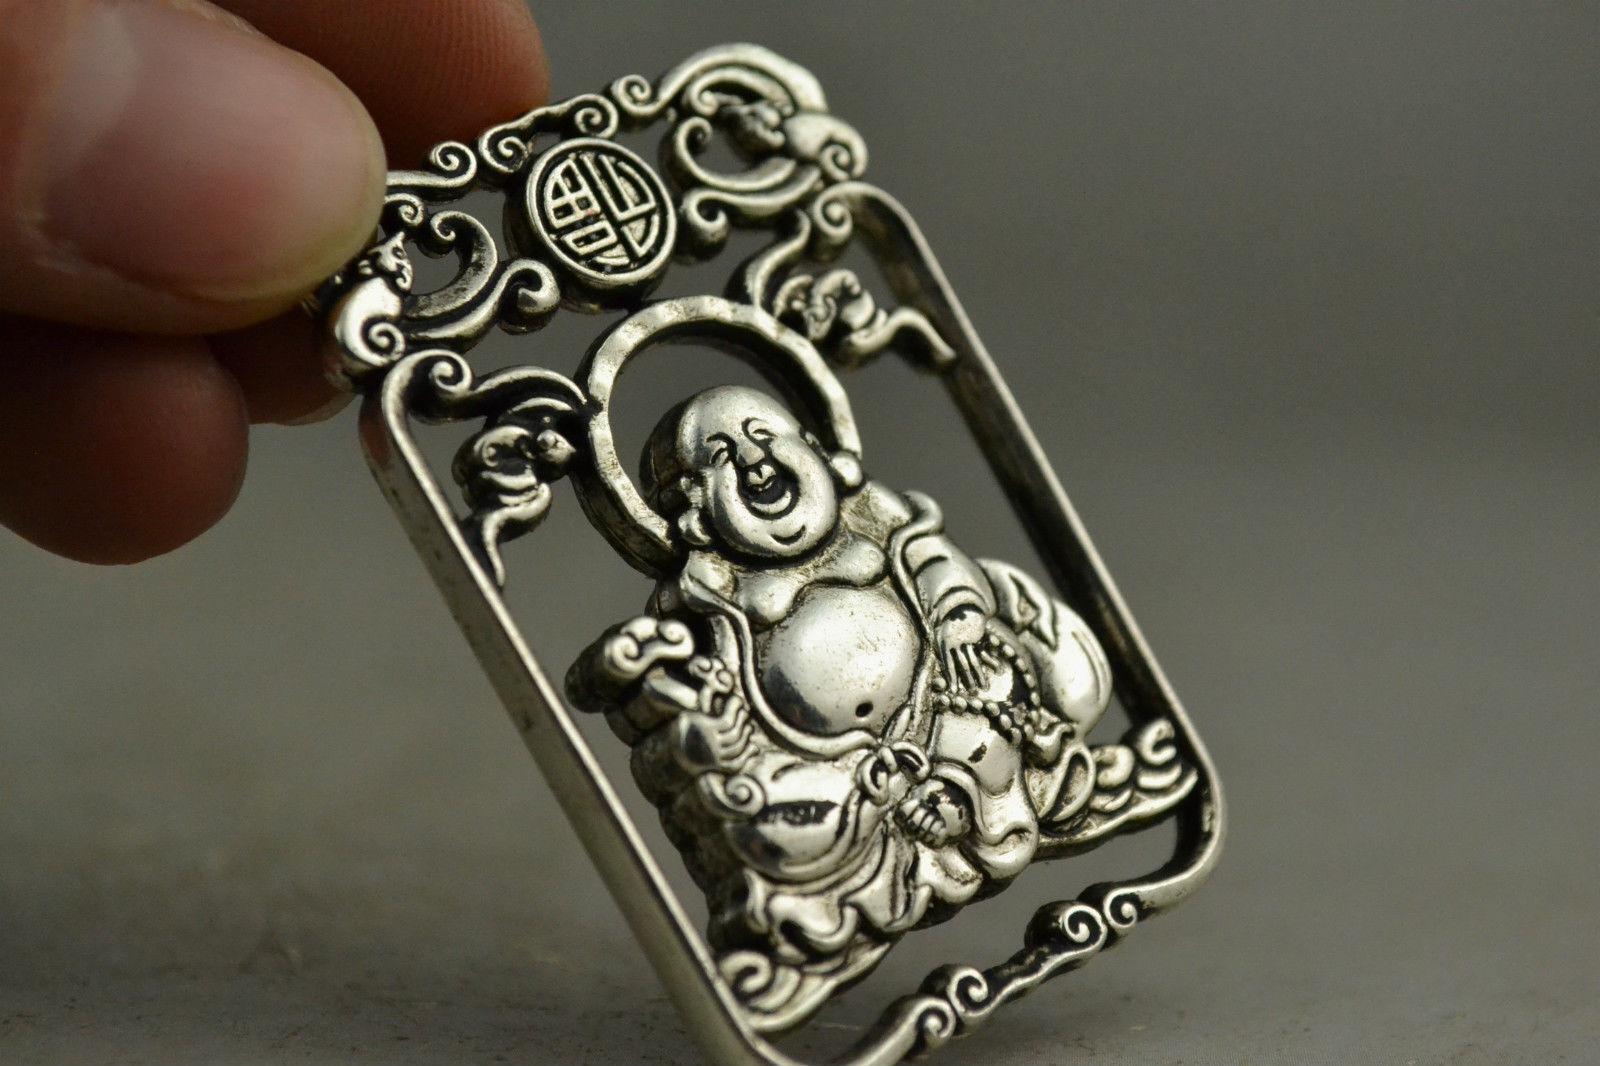 CHINA COLLECTIBLE HANDWORK OLD TIBETAN SILVER CARVING MAITREYA BUDDHA PENDANT